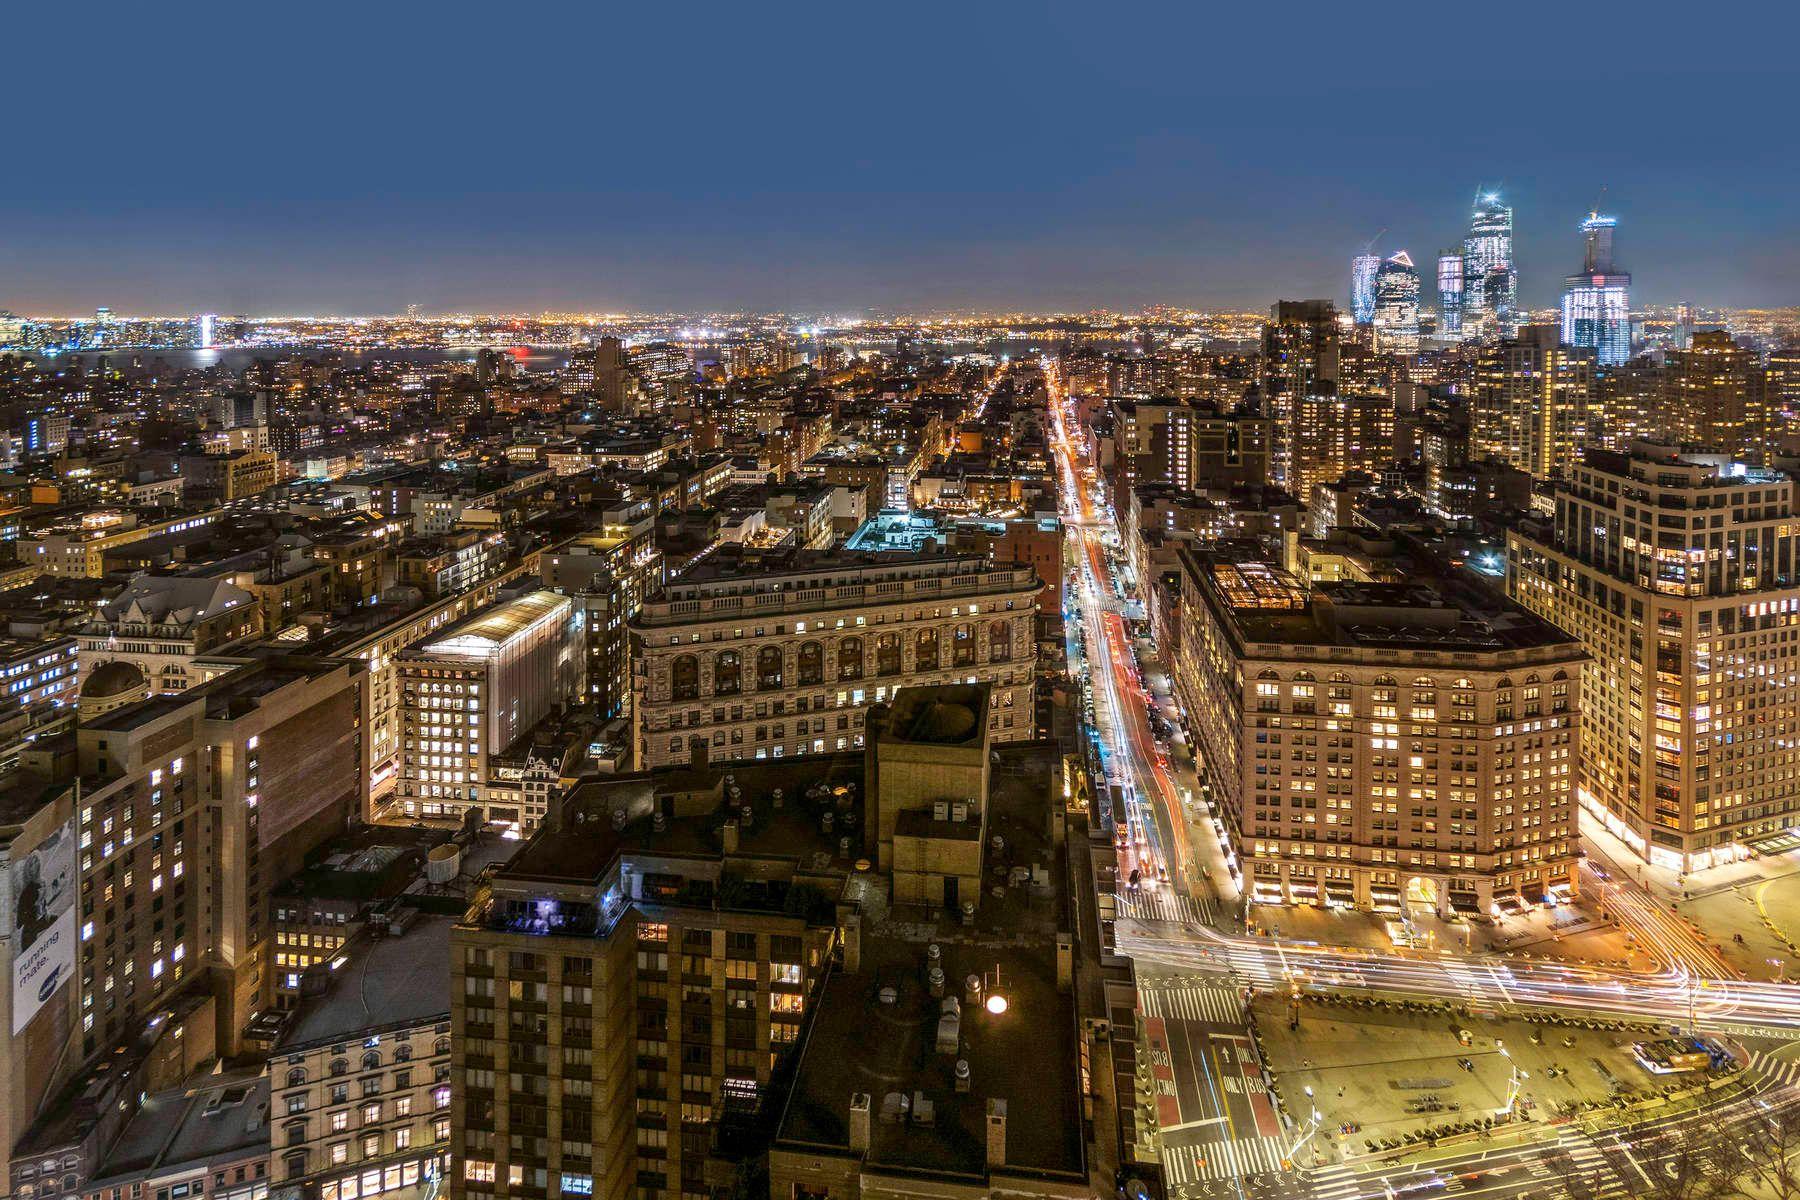 Vista di notte / Sothebys